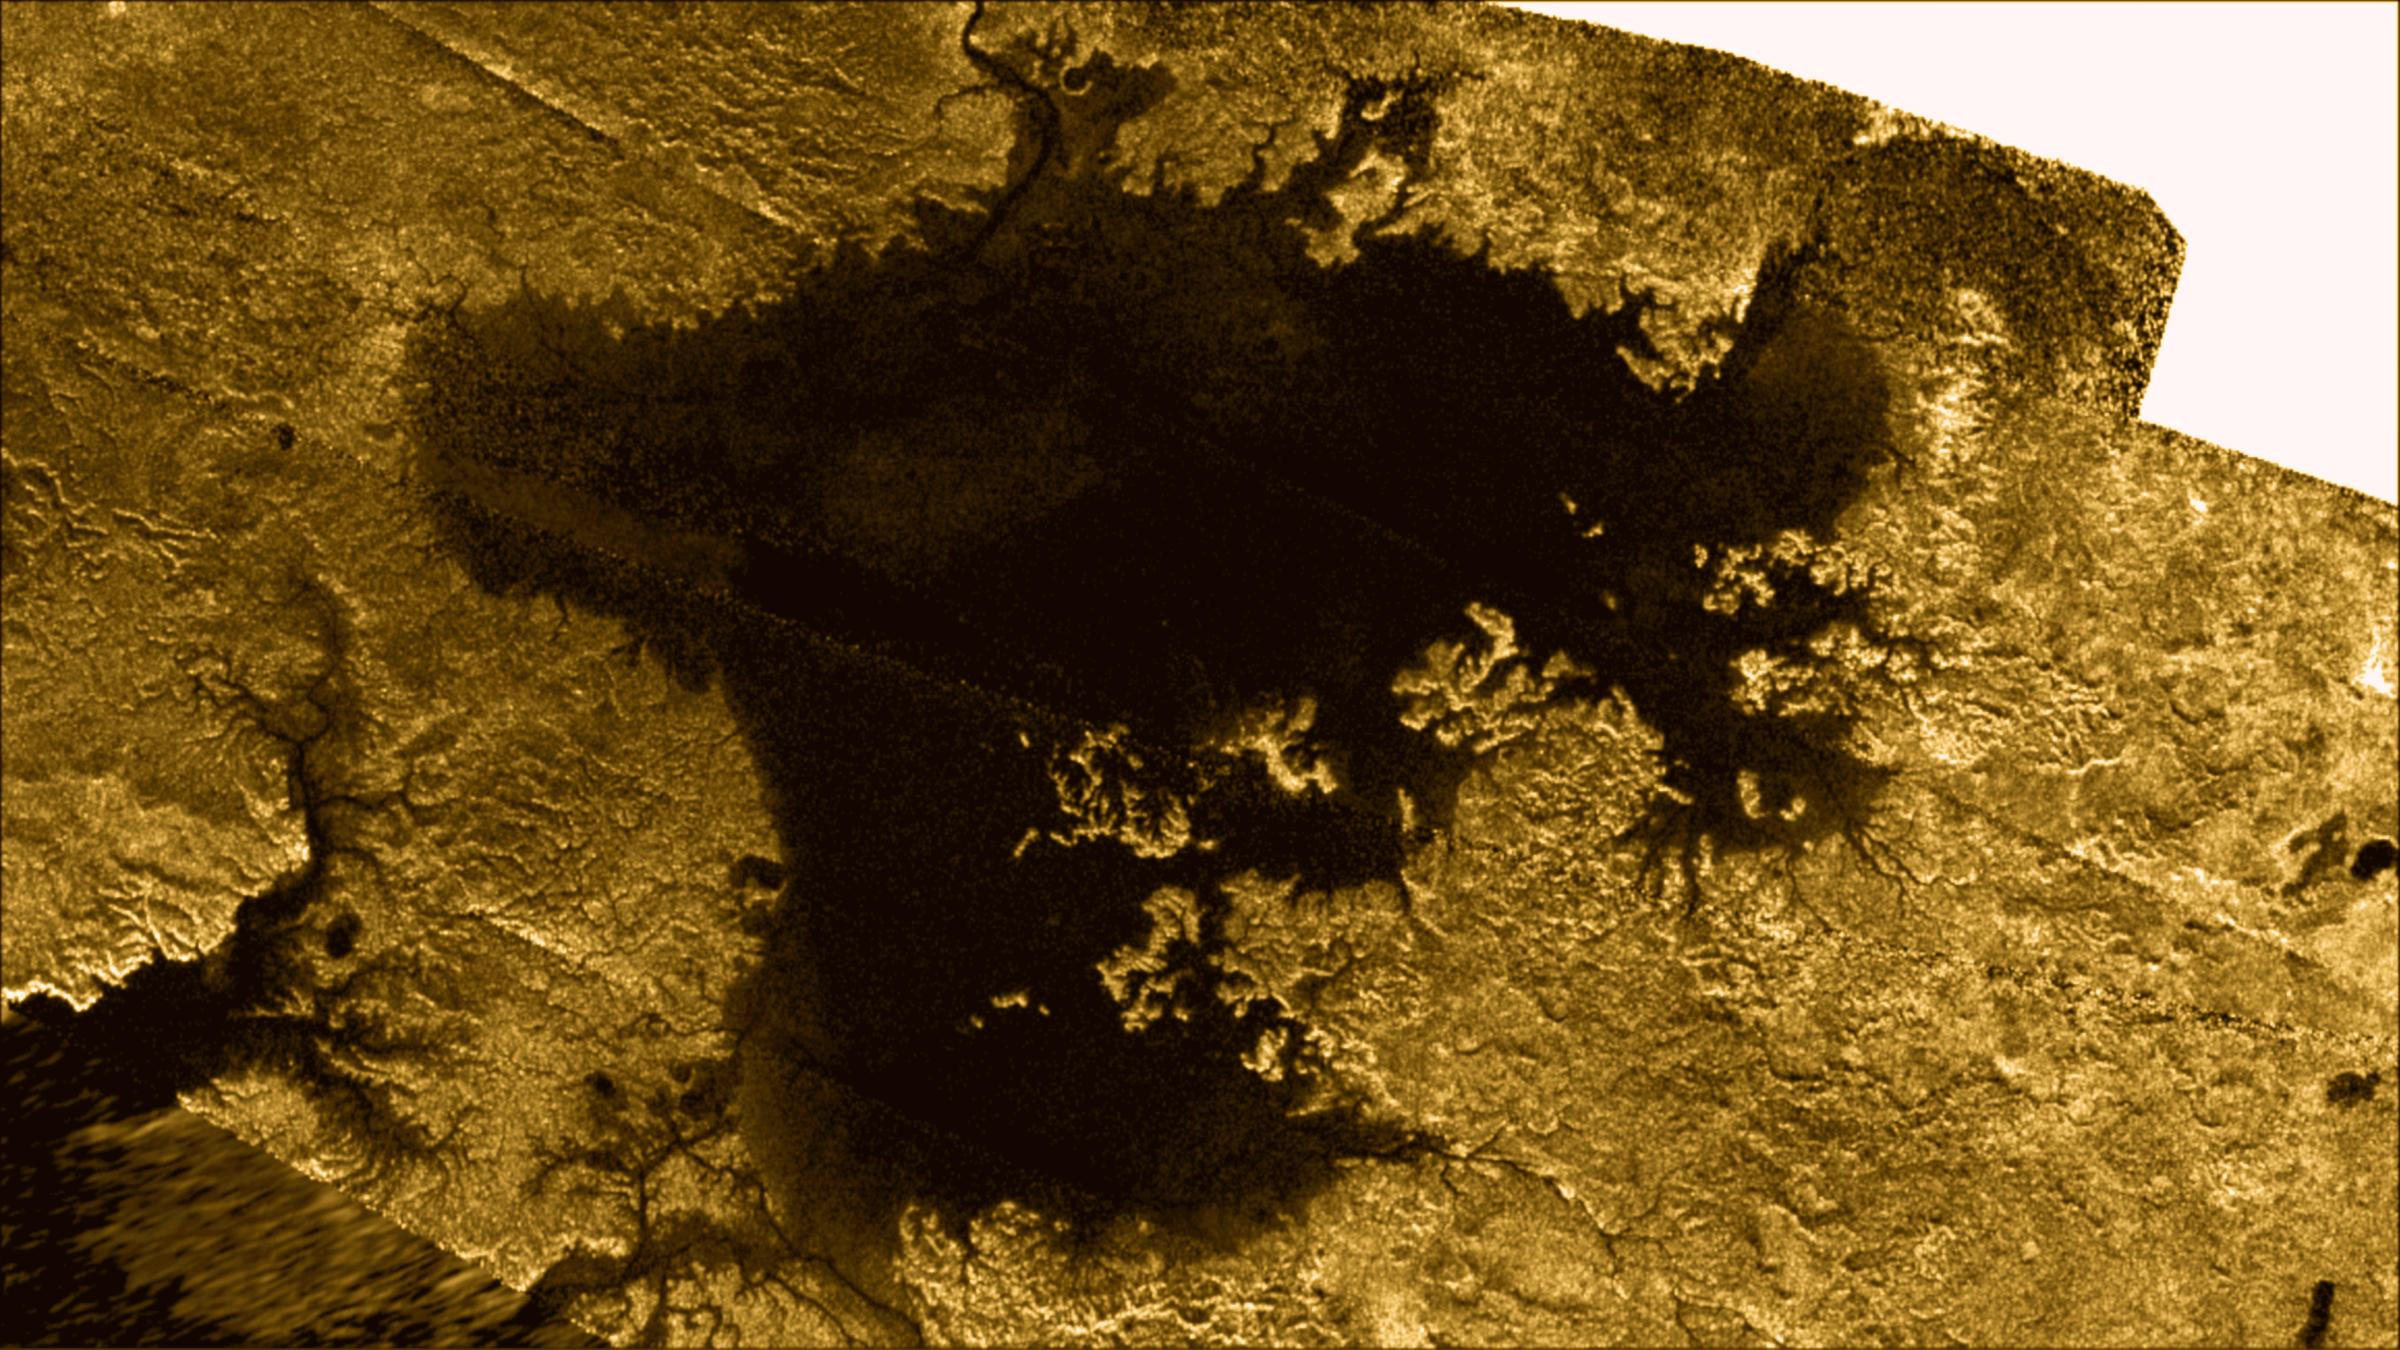 Hồ hydrocarbon trên bề mặt Vệ tinh Titan